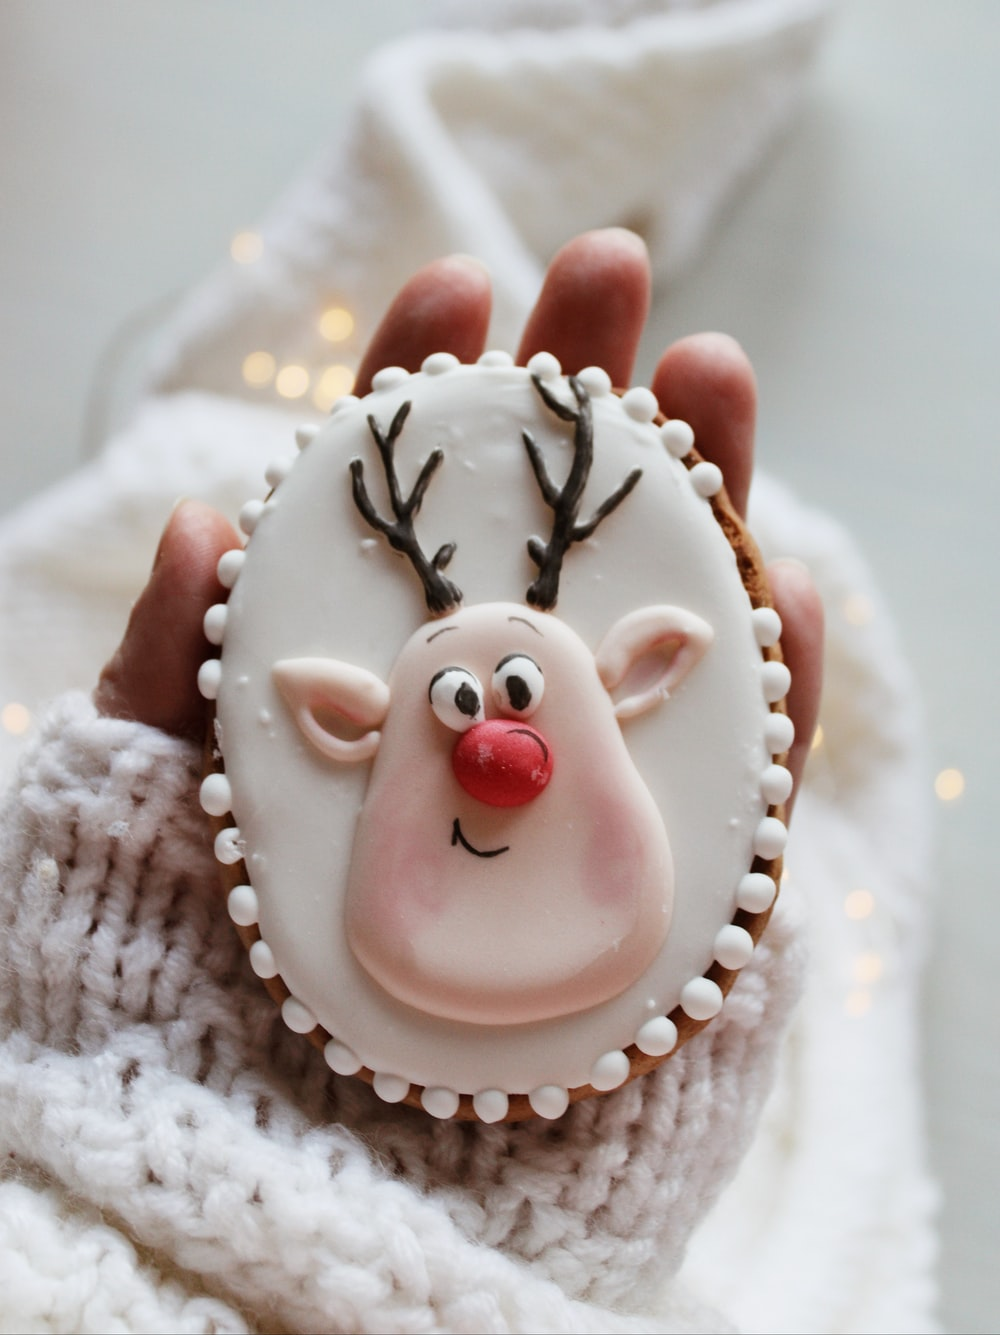 white and red ceramic snowman figurine